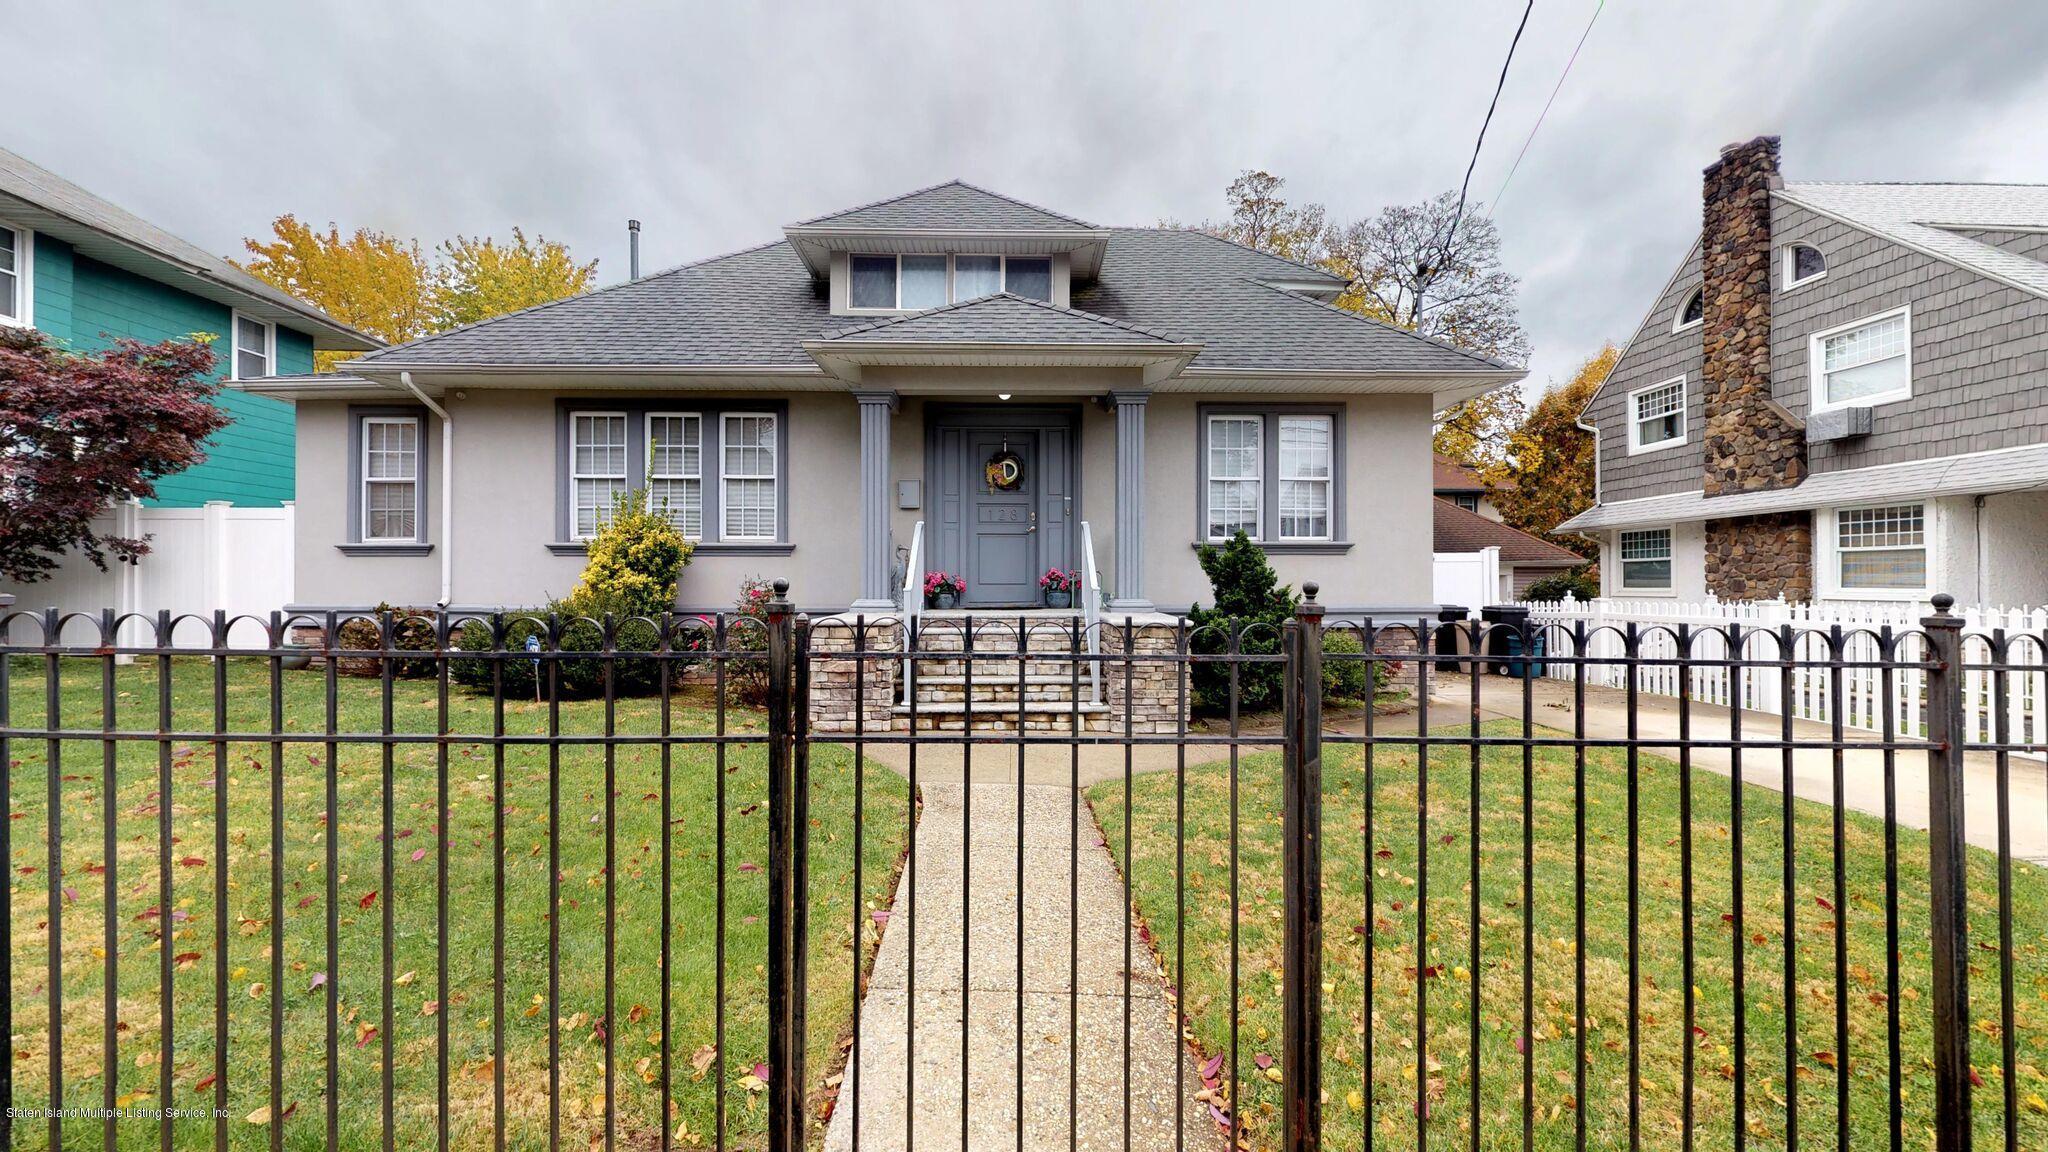 Single Family - Detached 128 Pelton Avenue  Staten Island, NY 10310, MLS-1124023-2